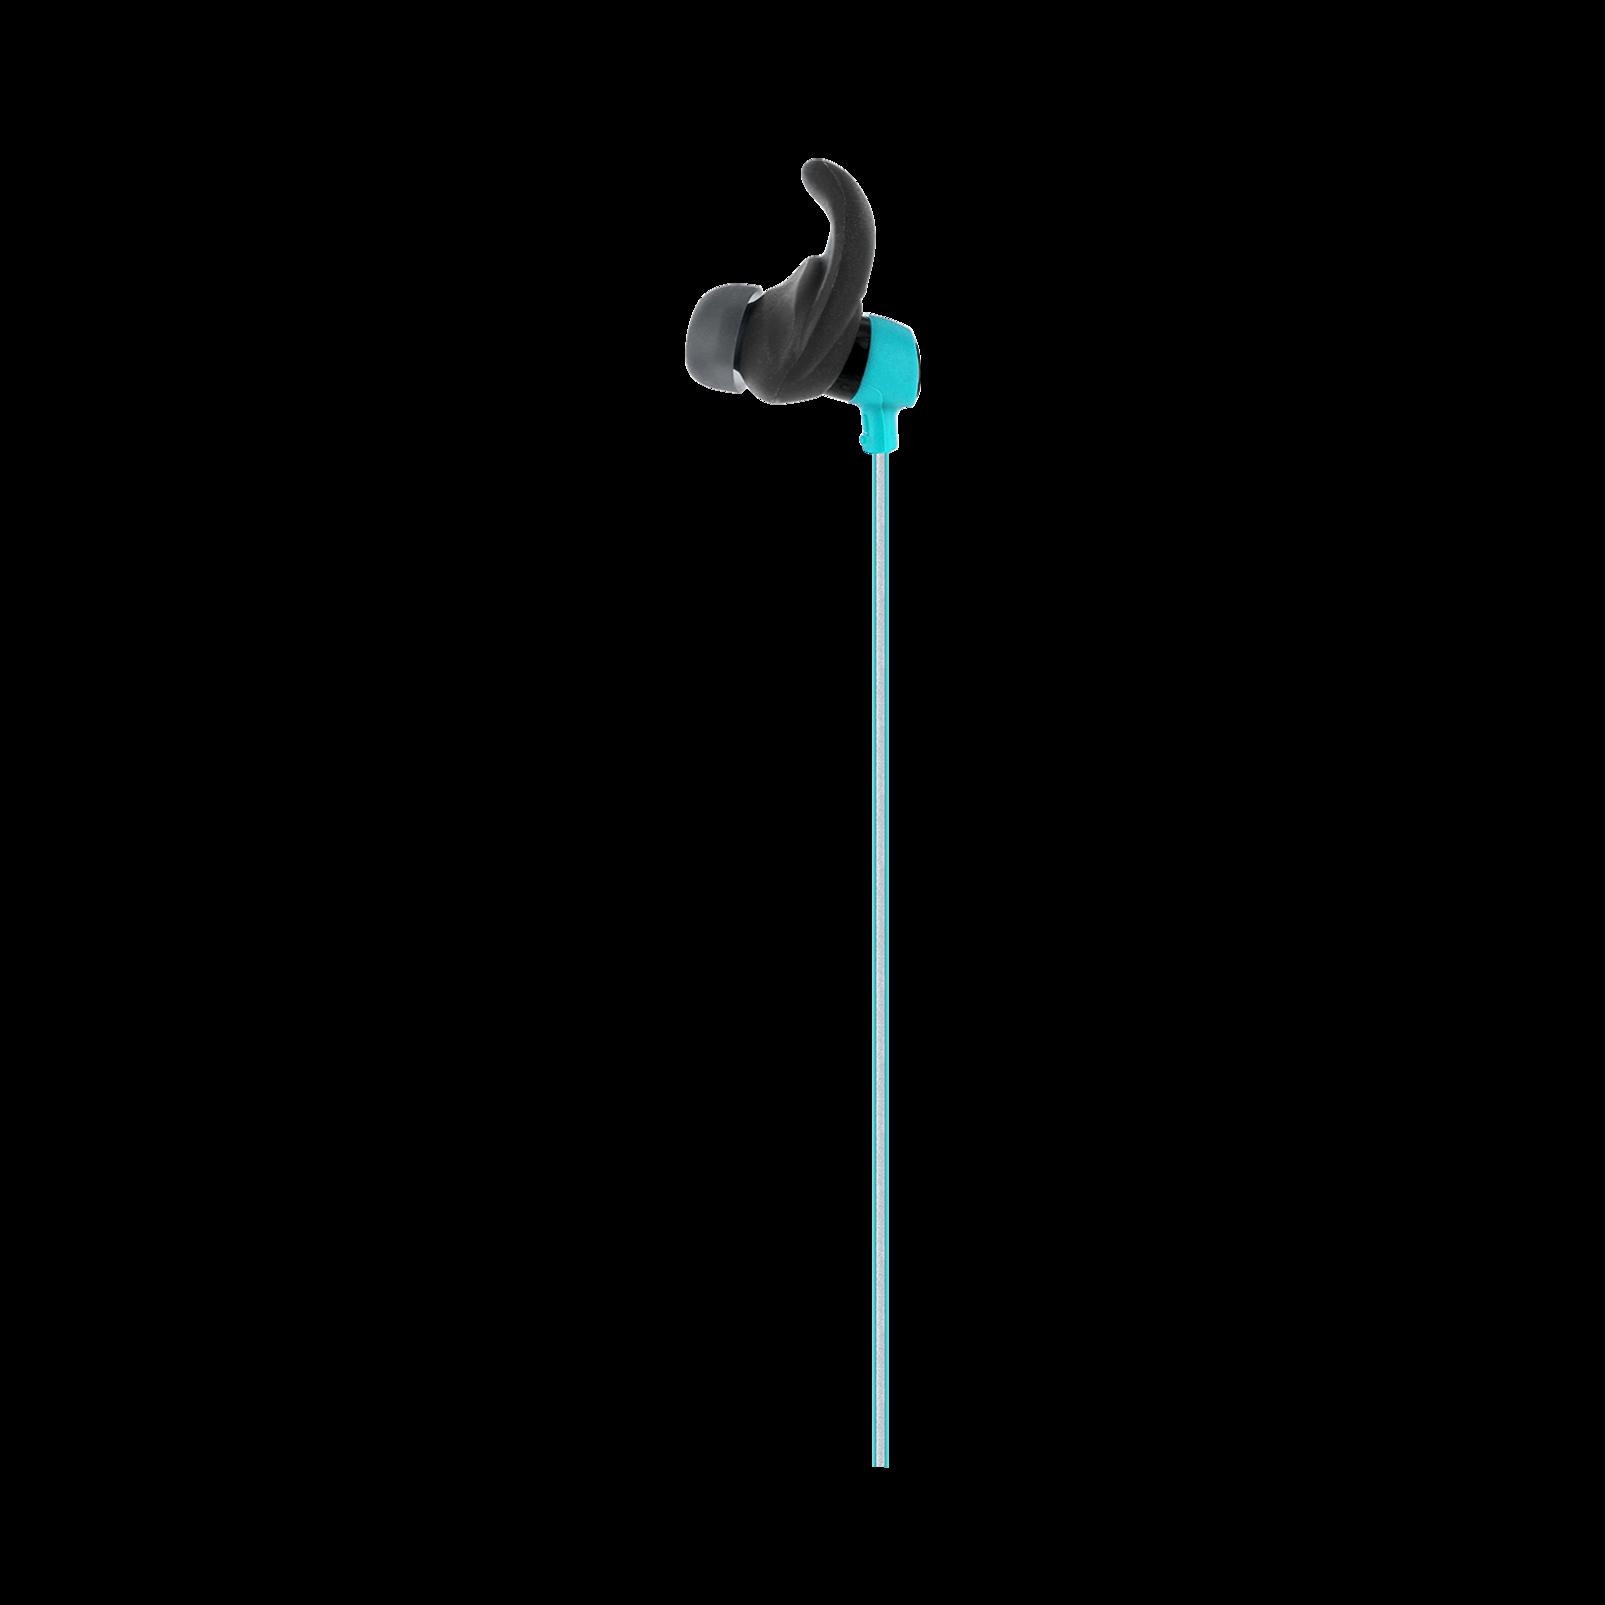 Reflect Mini - Teal - Lightweight, in-ear sport headphones - Detailshot 7